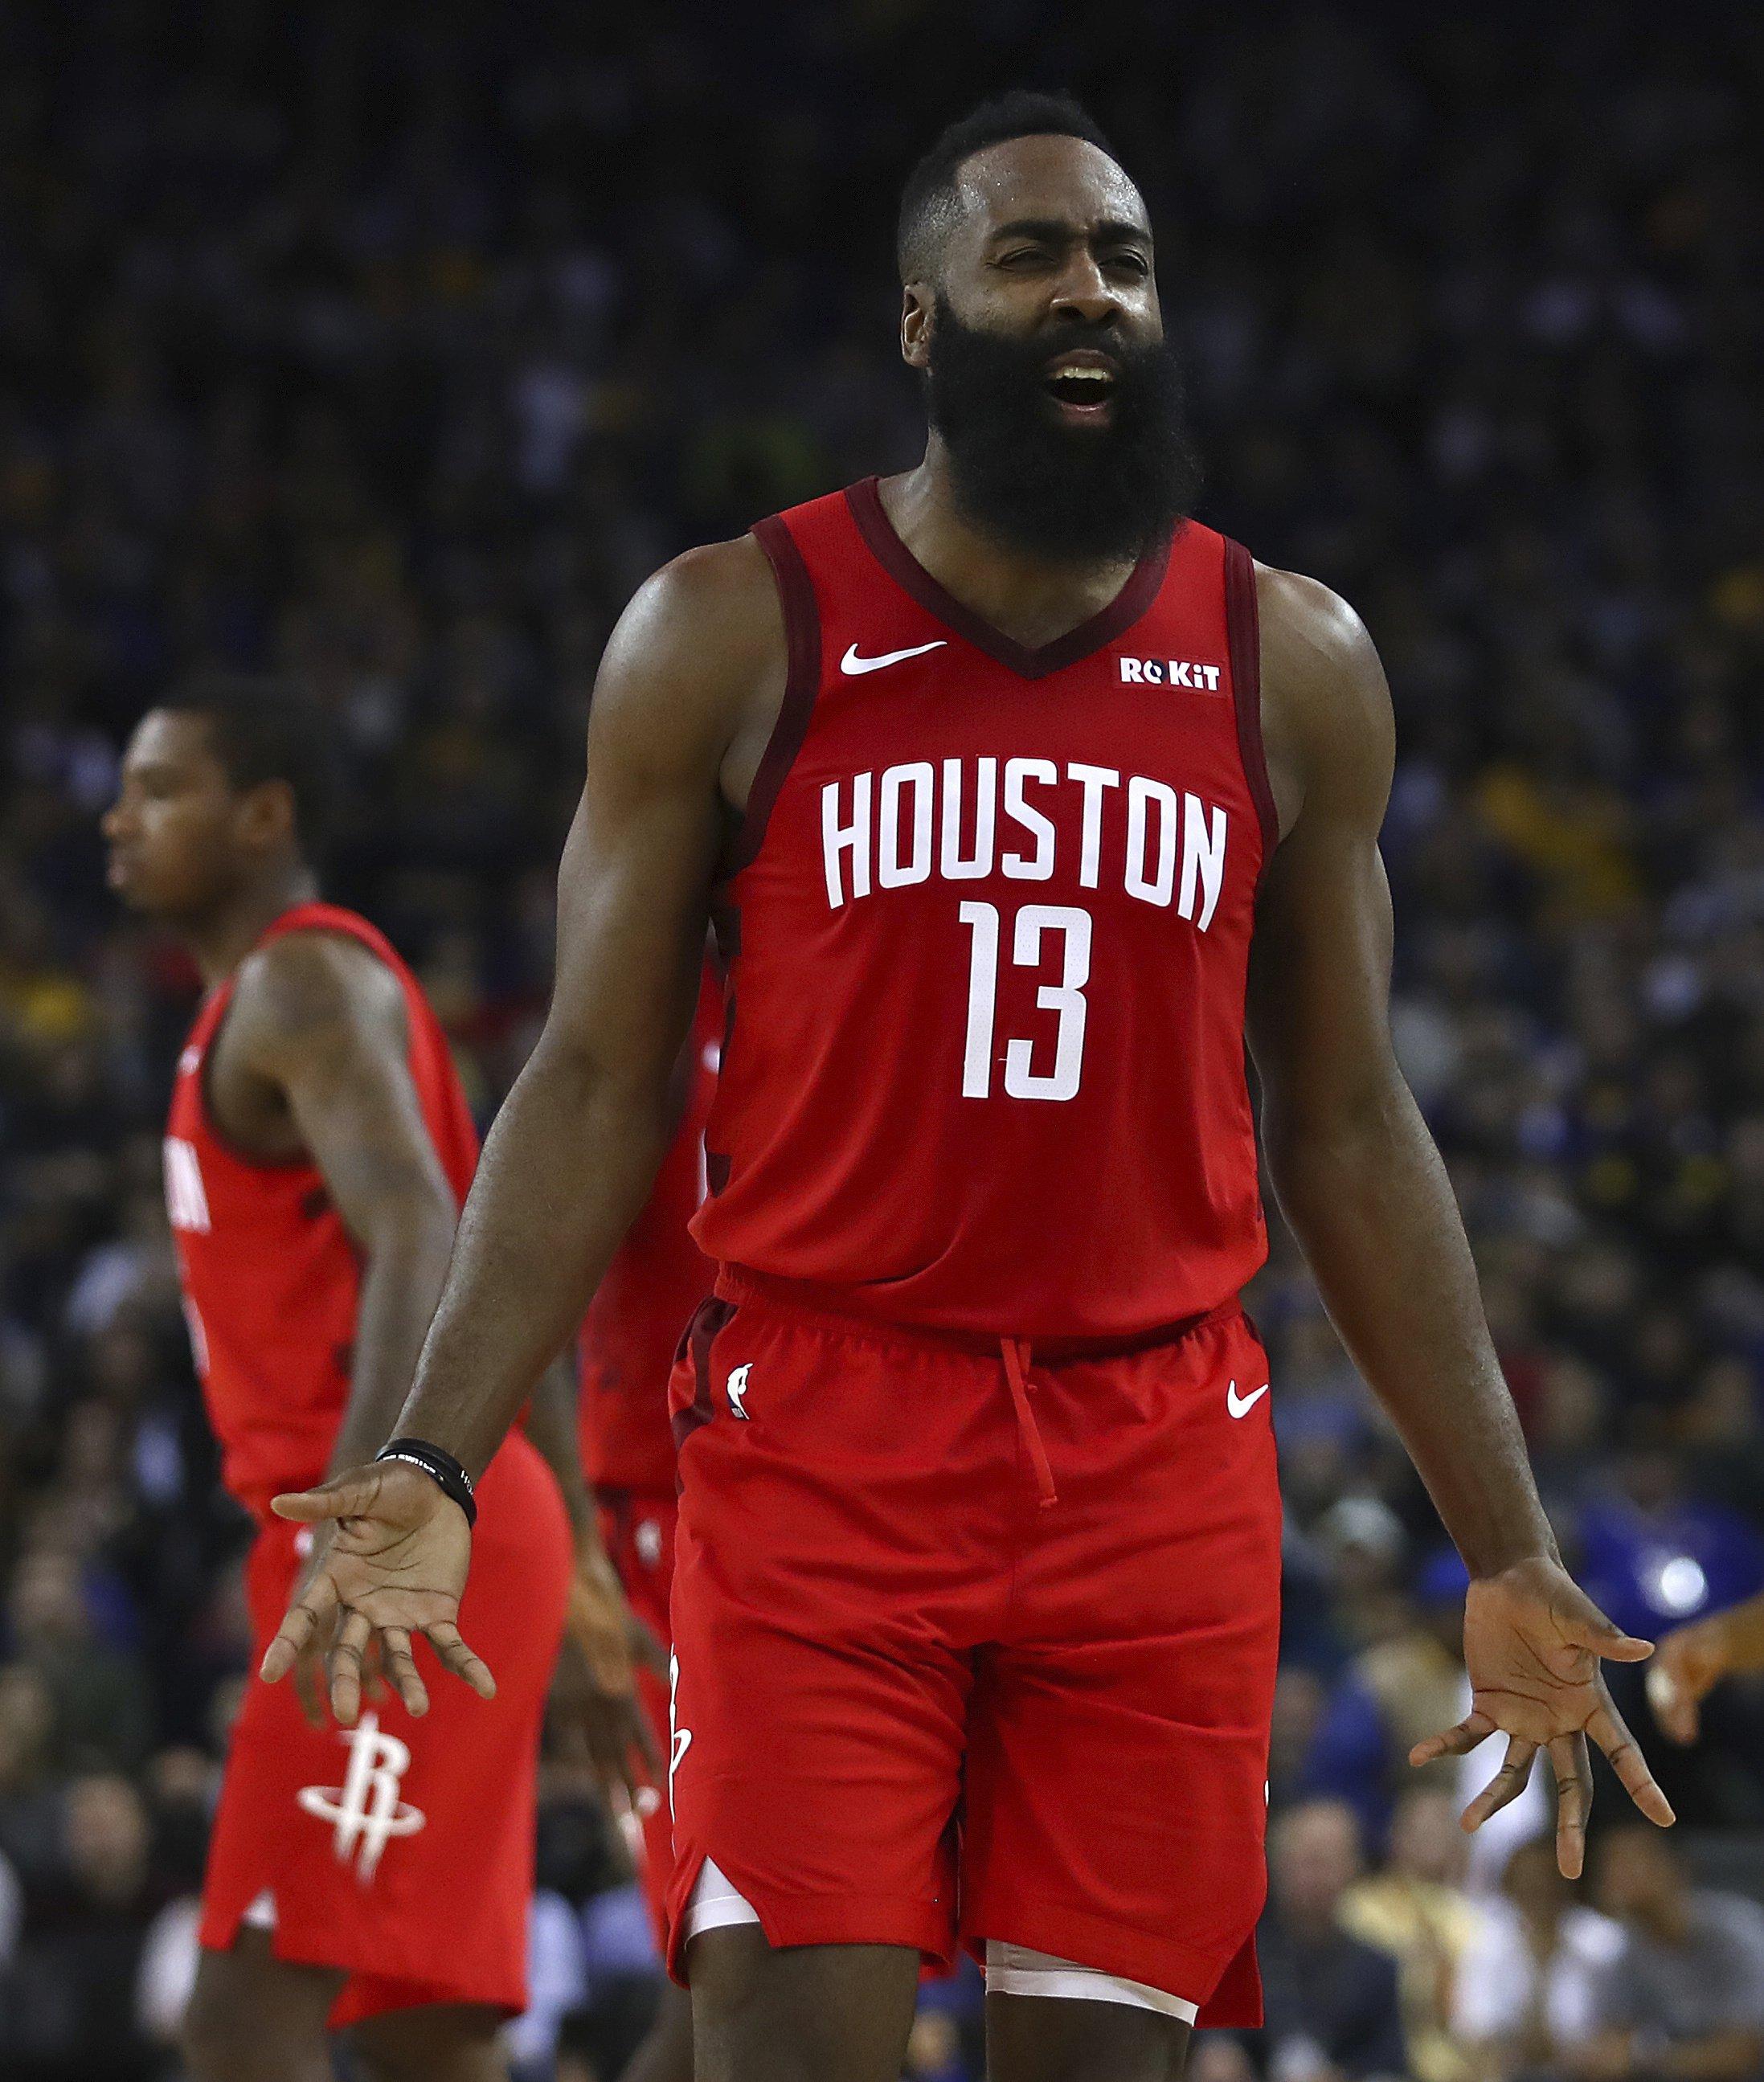 b51feac6c9d4 Harden rallies Rockets in OT to edge Warriors 135-134